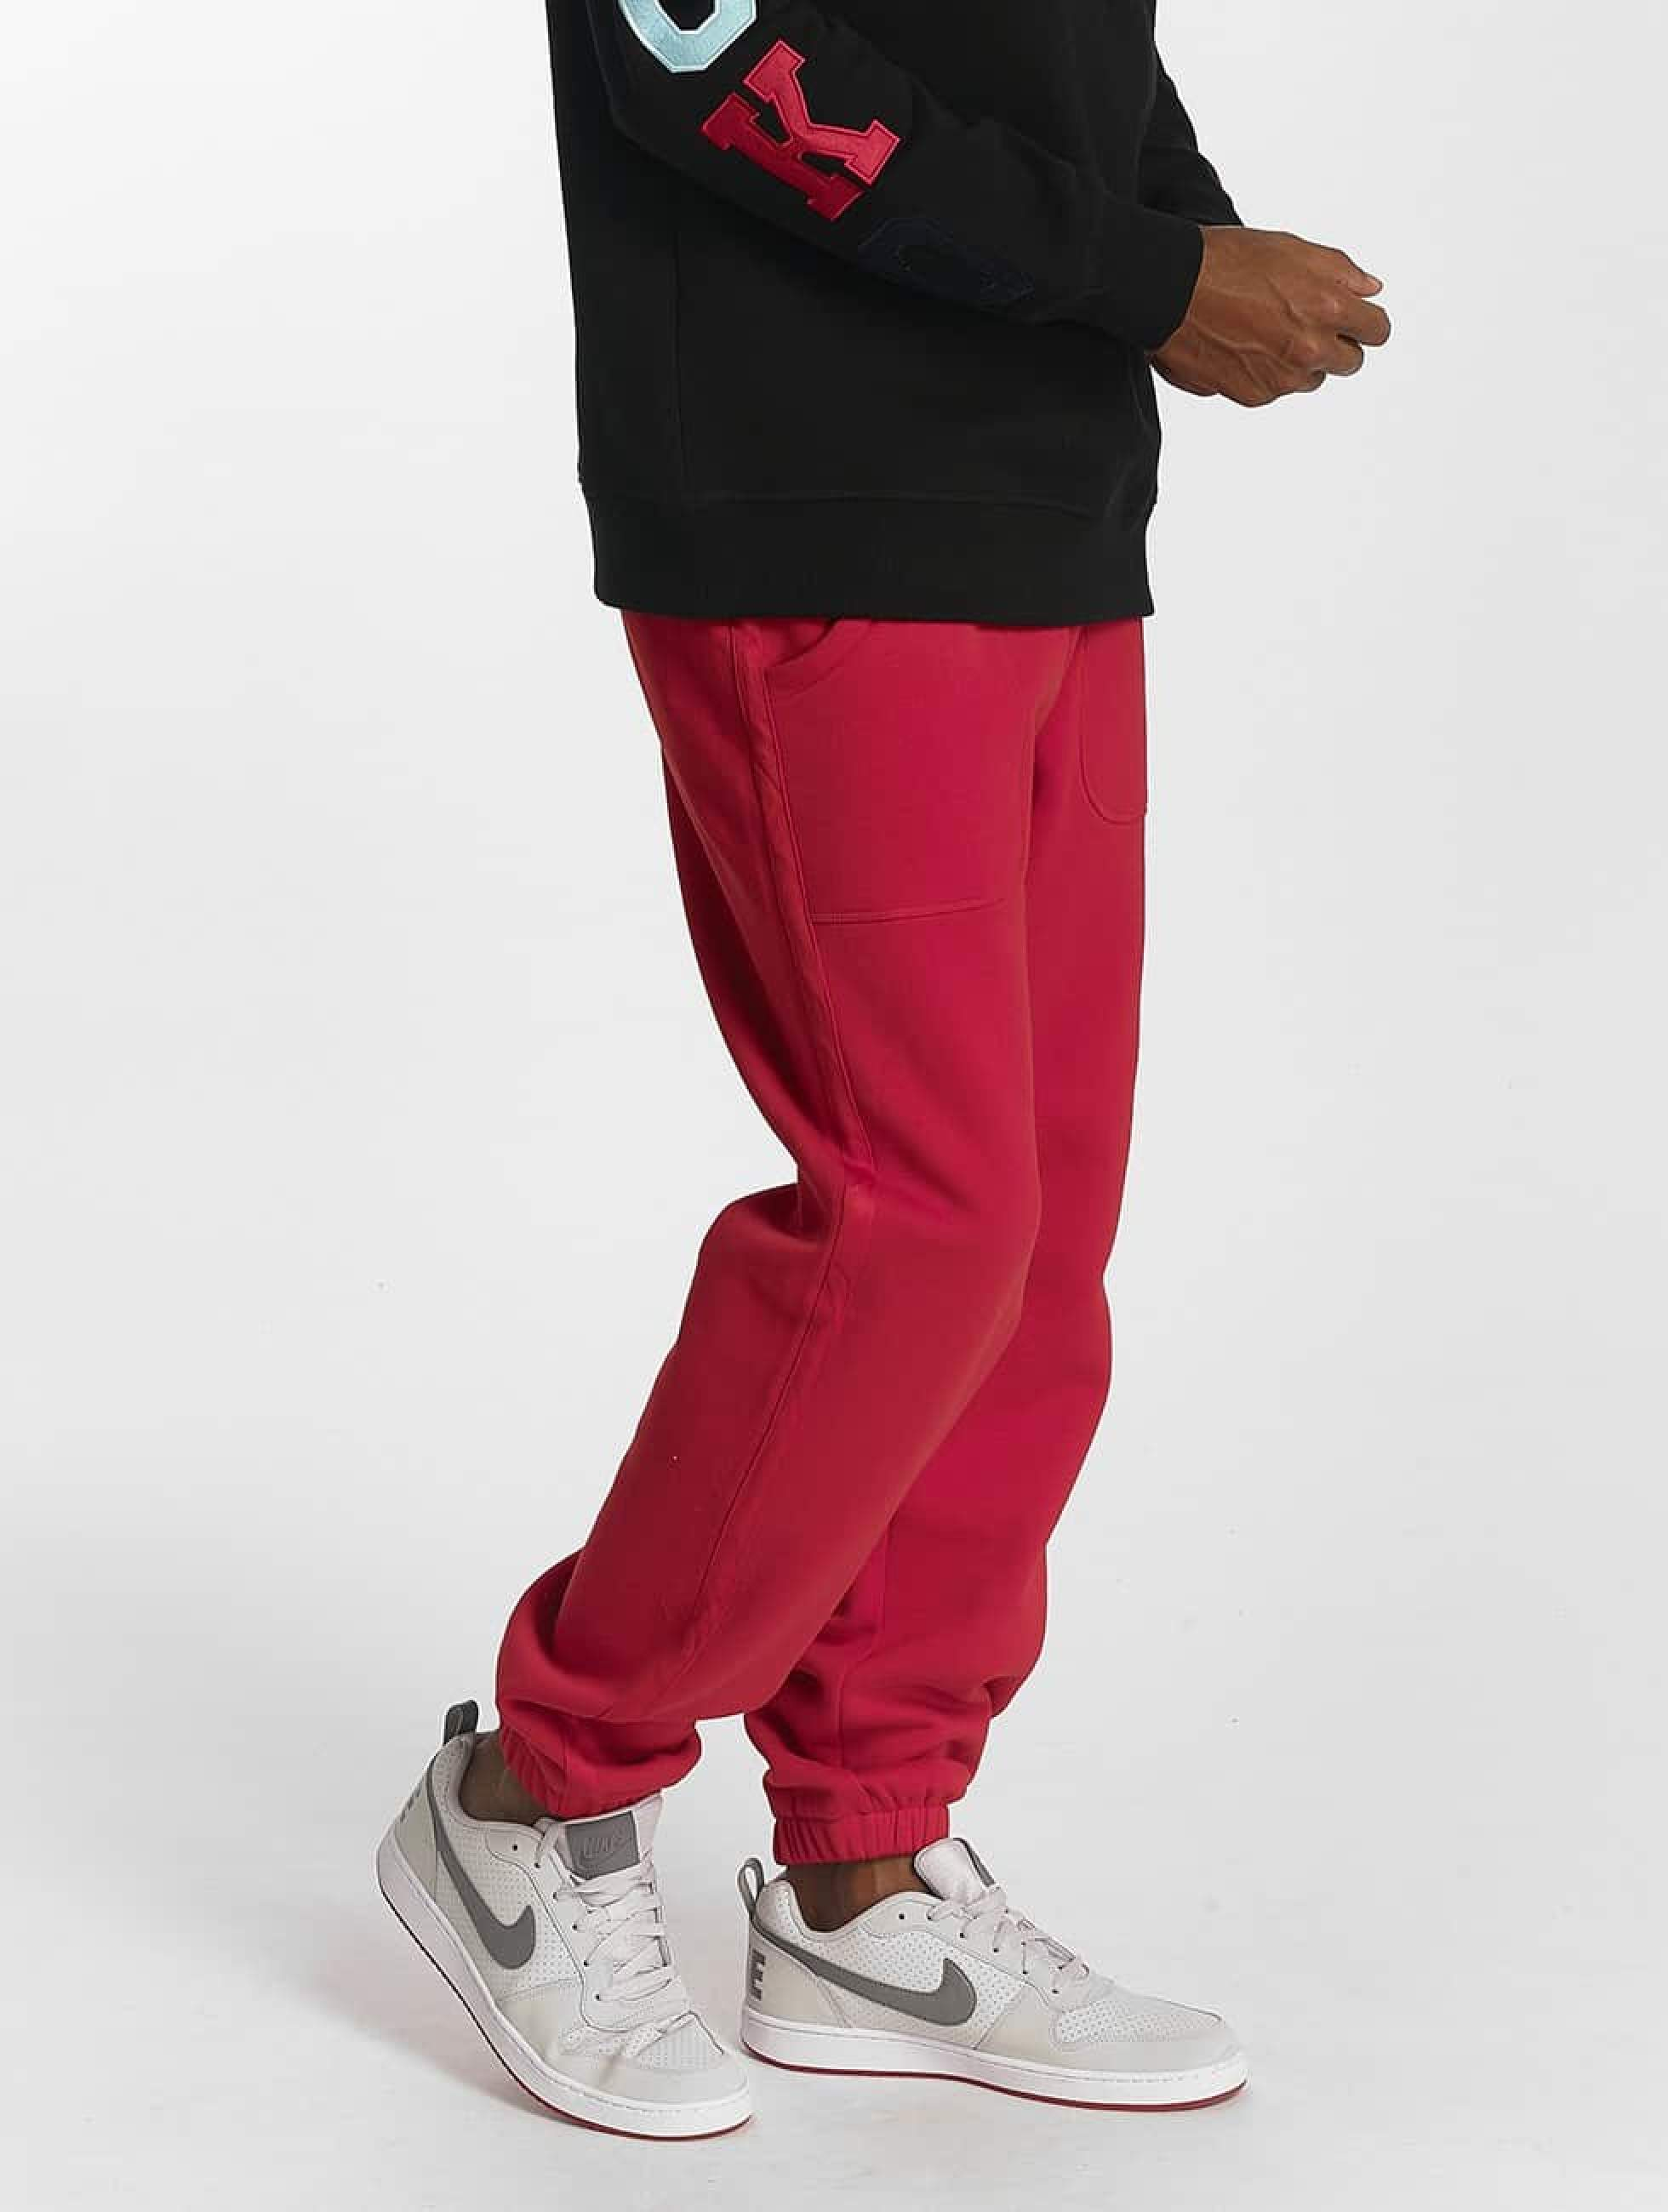 Ecko Unltd. / Sweat Pant First Avenue in red XL